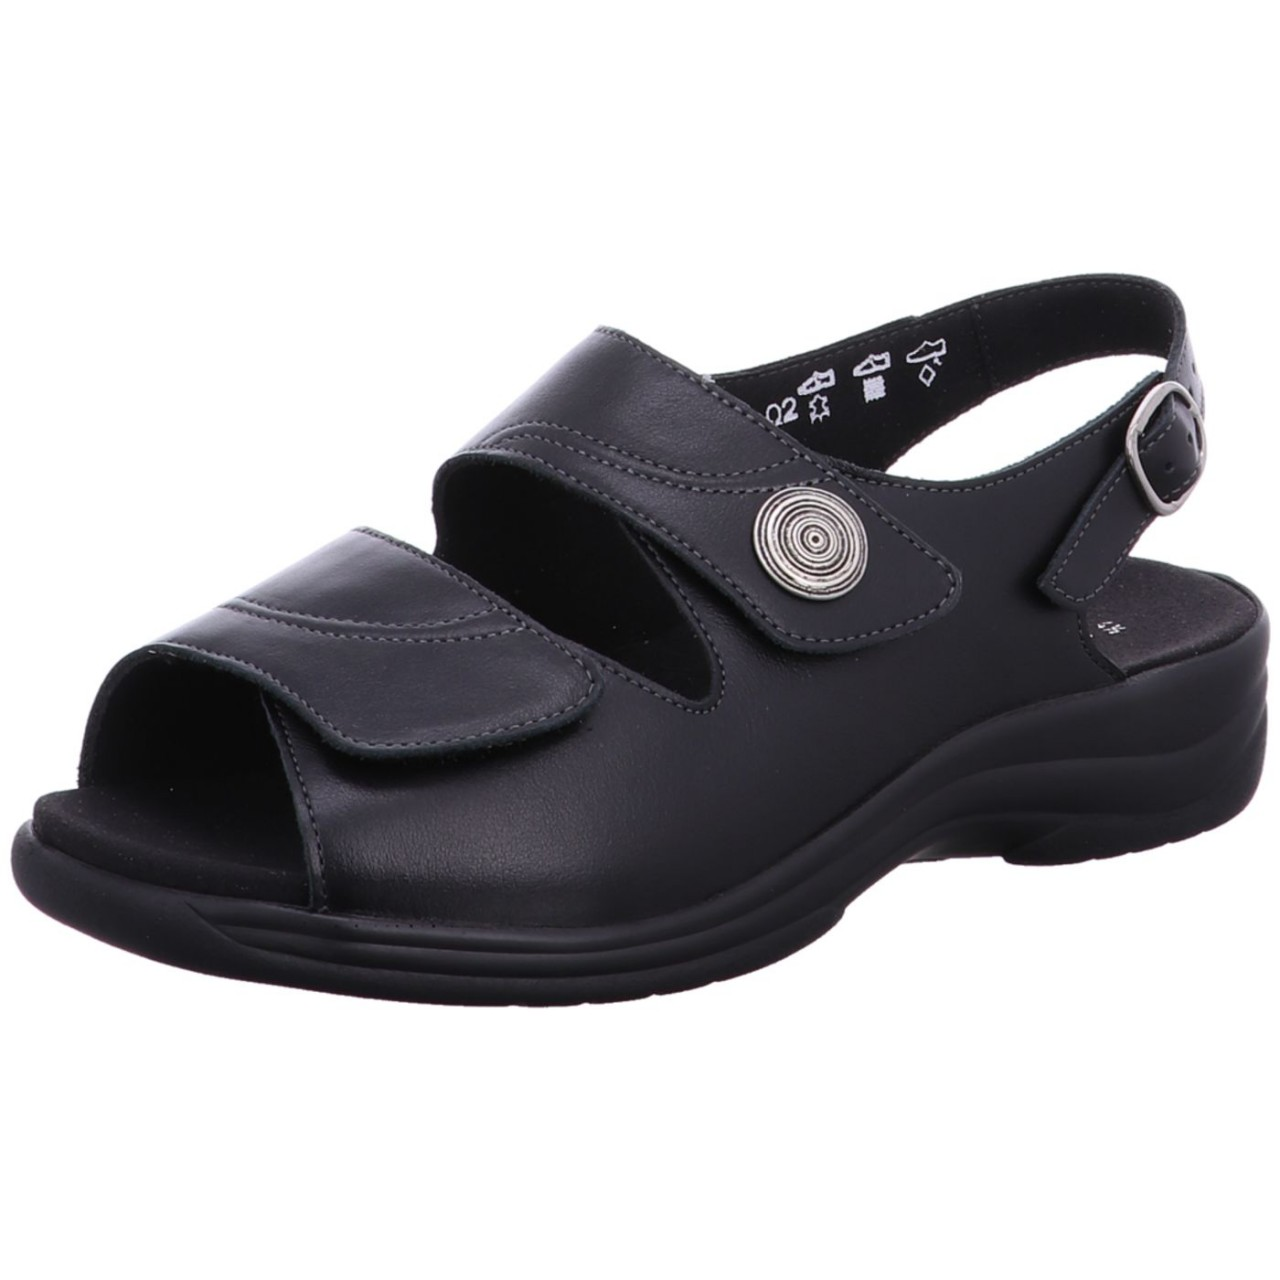 Solidus Sandale Moni Schwarz 74003 00098